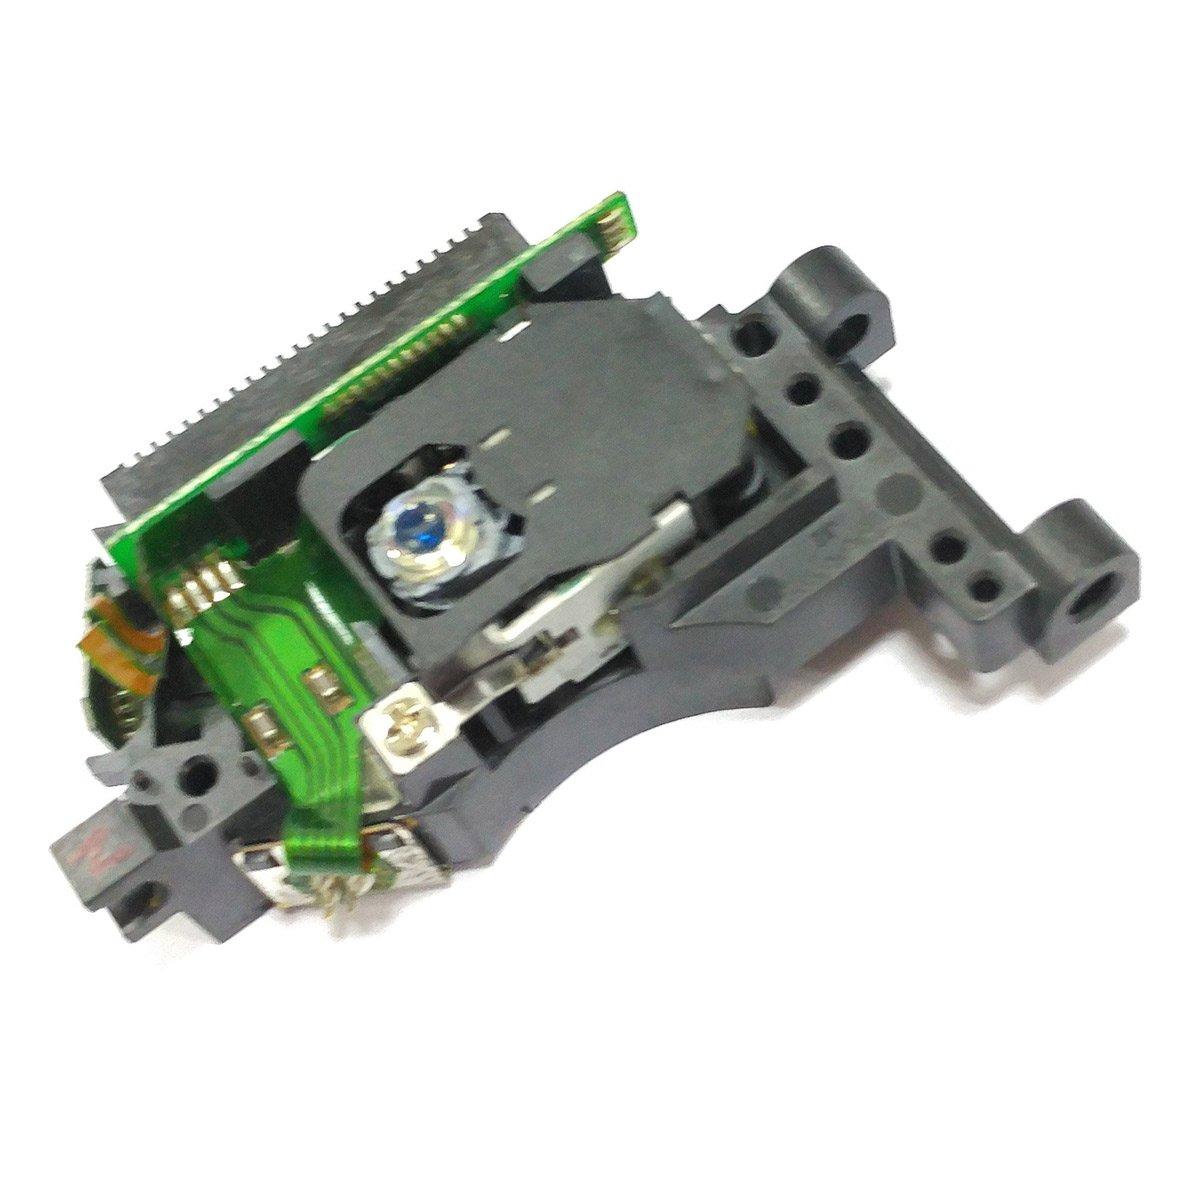 Original SACD Optical Pickup for TEAC Esoteric DV-60 SACD Laser Lens by Allpartz